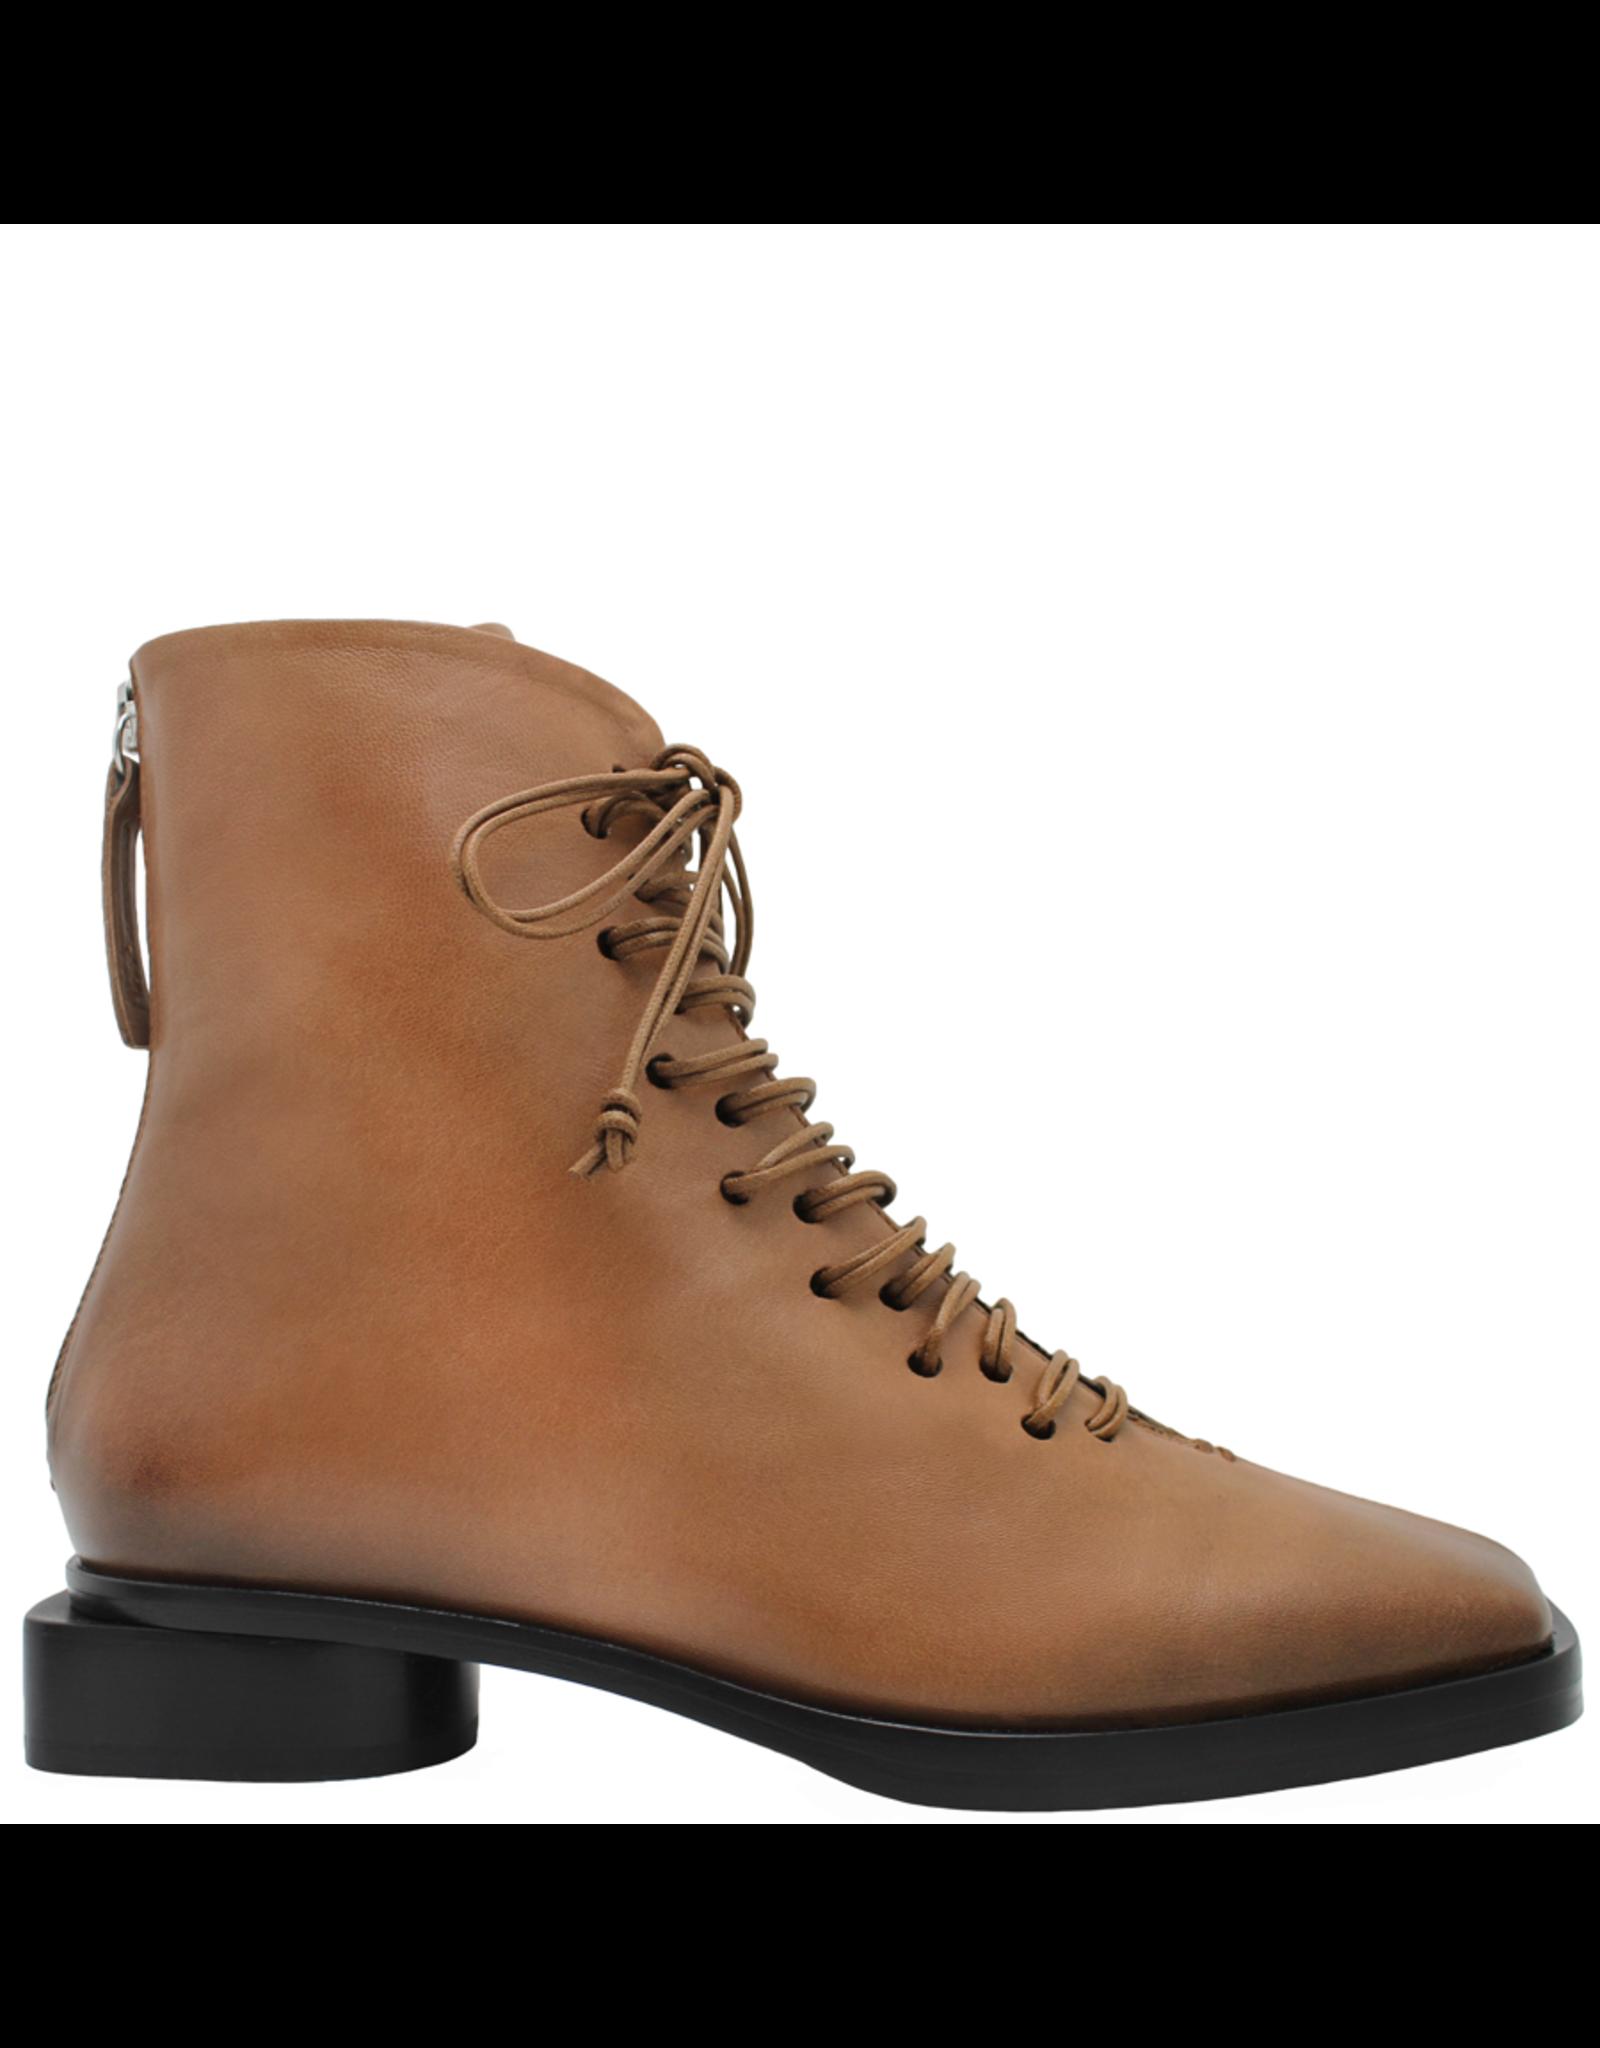 Halmanera Halmanera Spice Lace-Up Back Zip Boot 2048